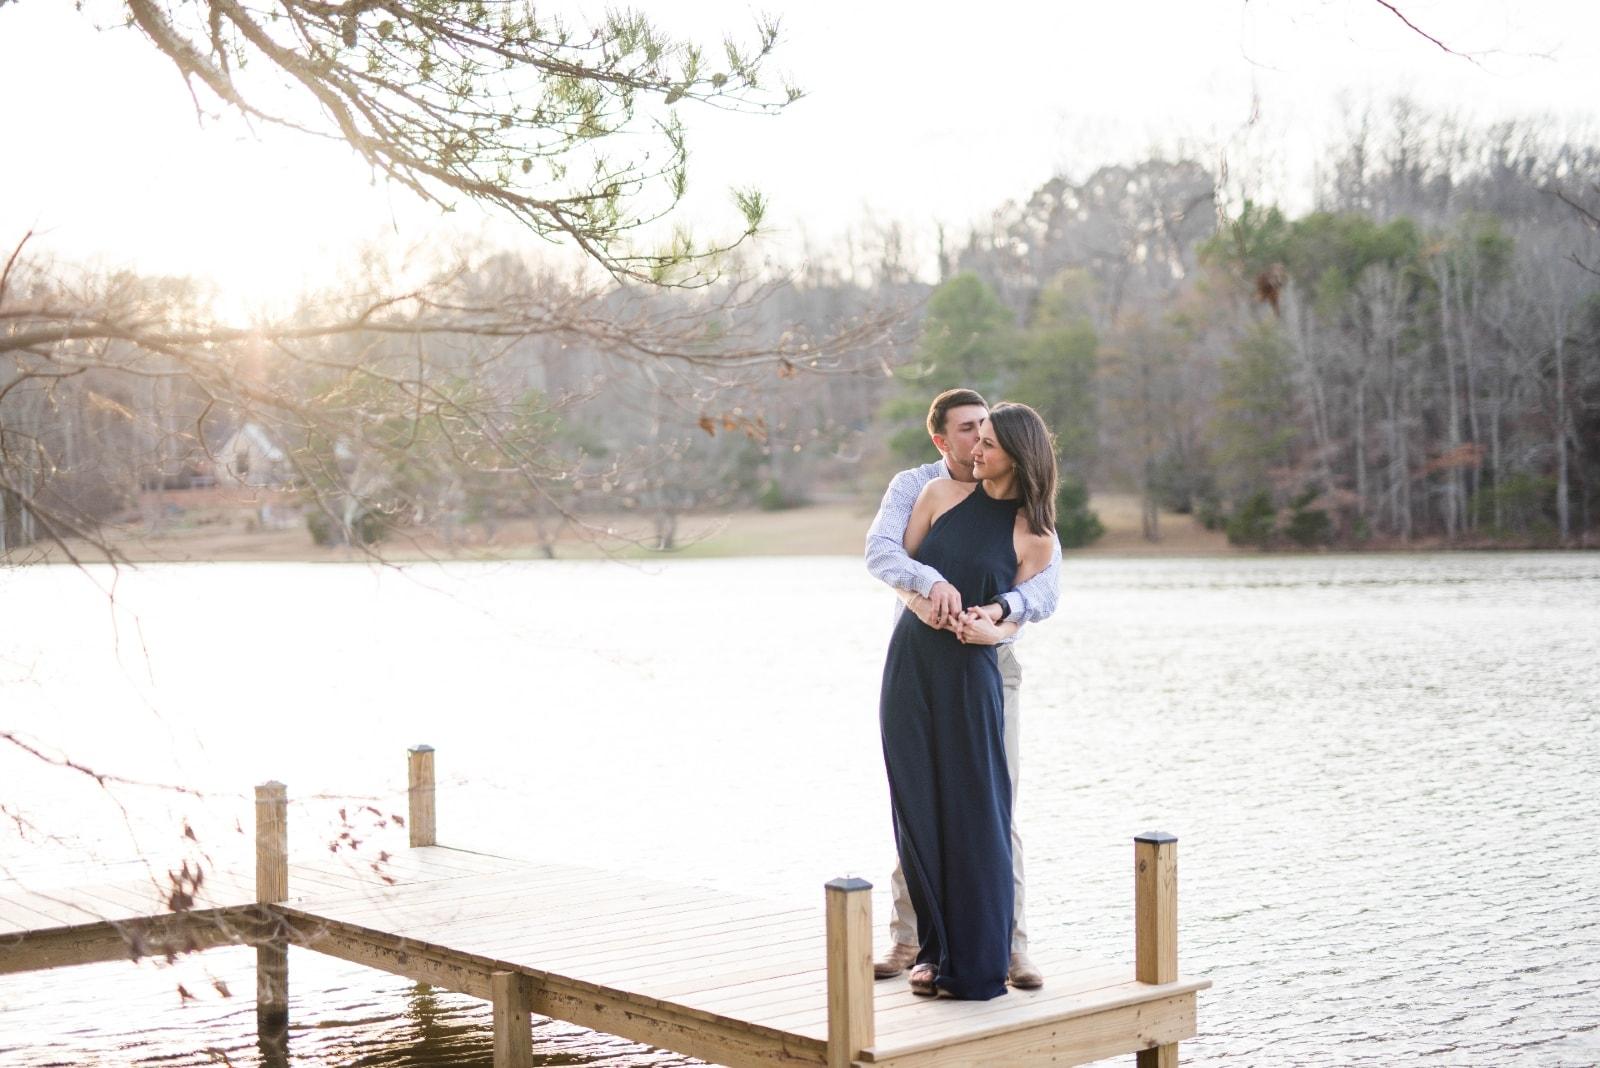 man hugging woman while standing near water